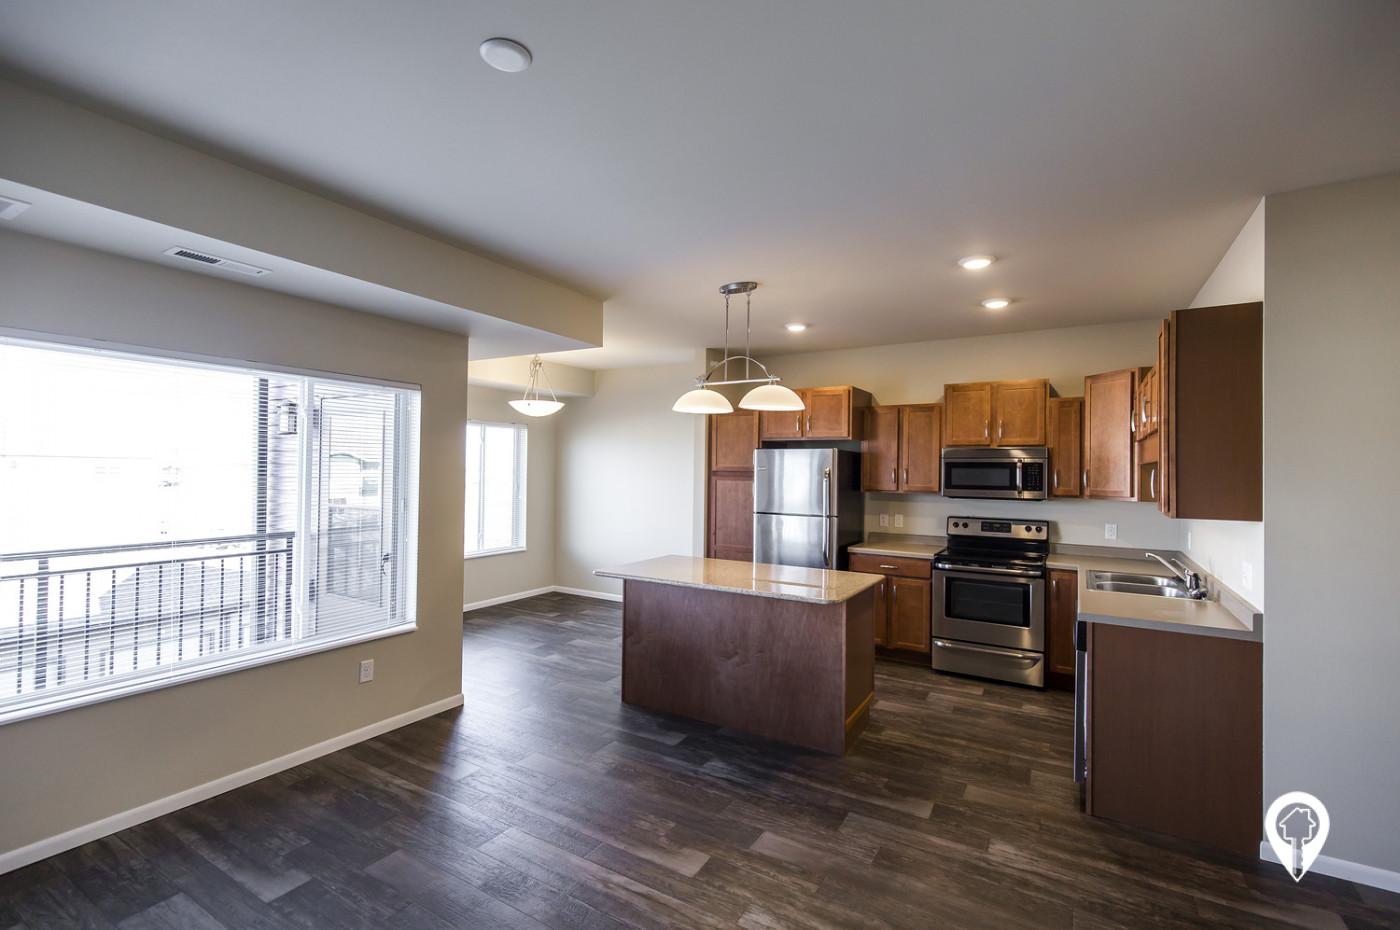 River-Ridge-Apartment-Homes-Stainless-Steel-Appliances-Granite-Kitchen-Island